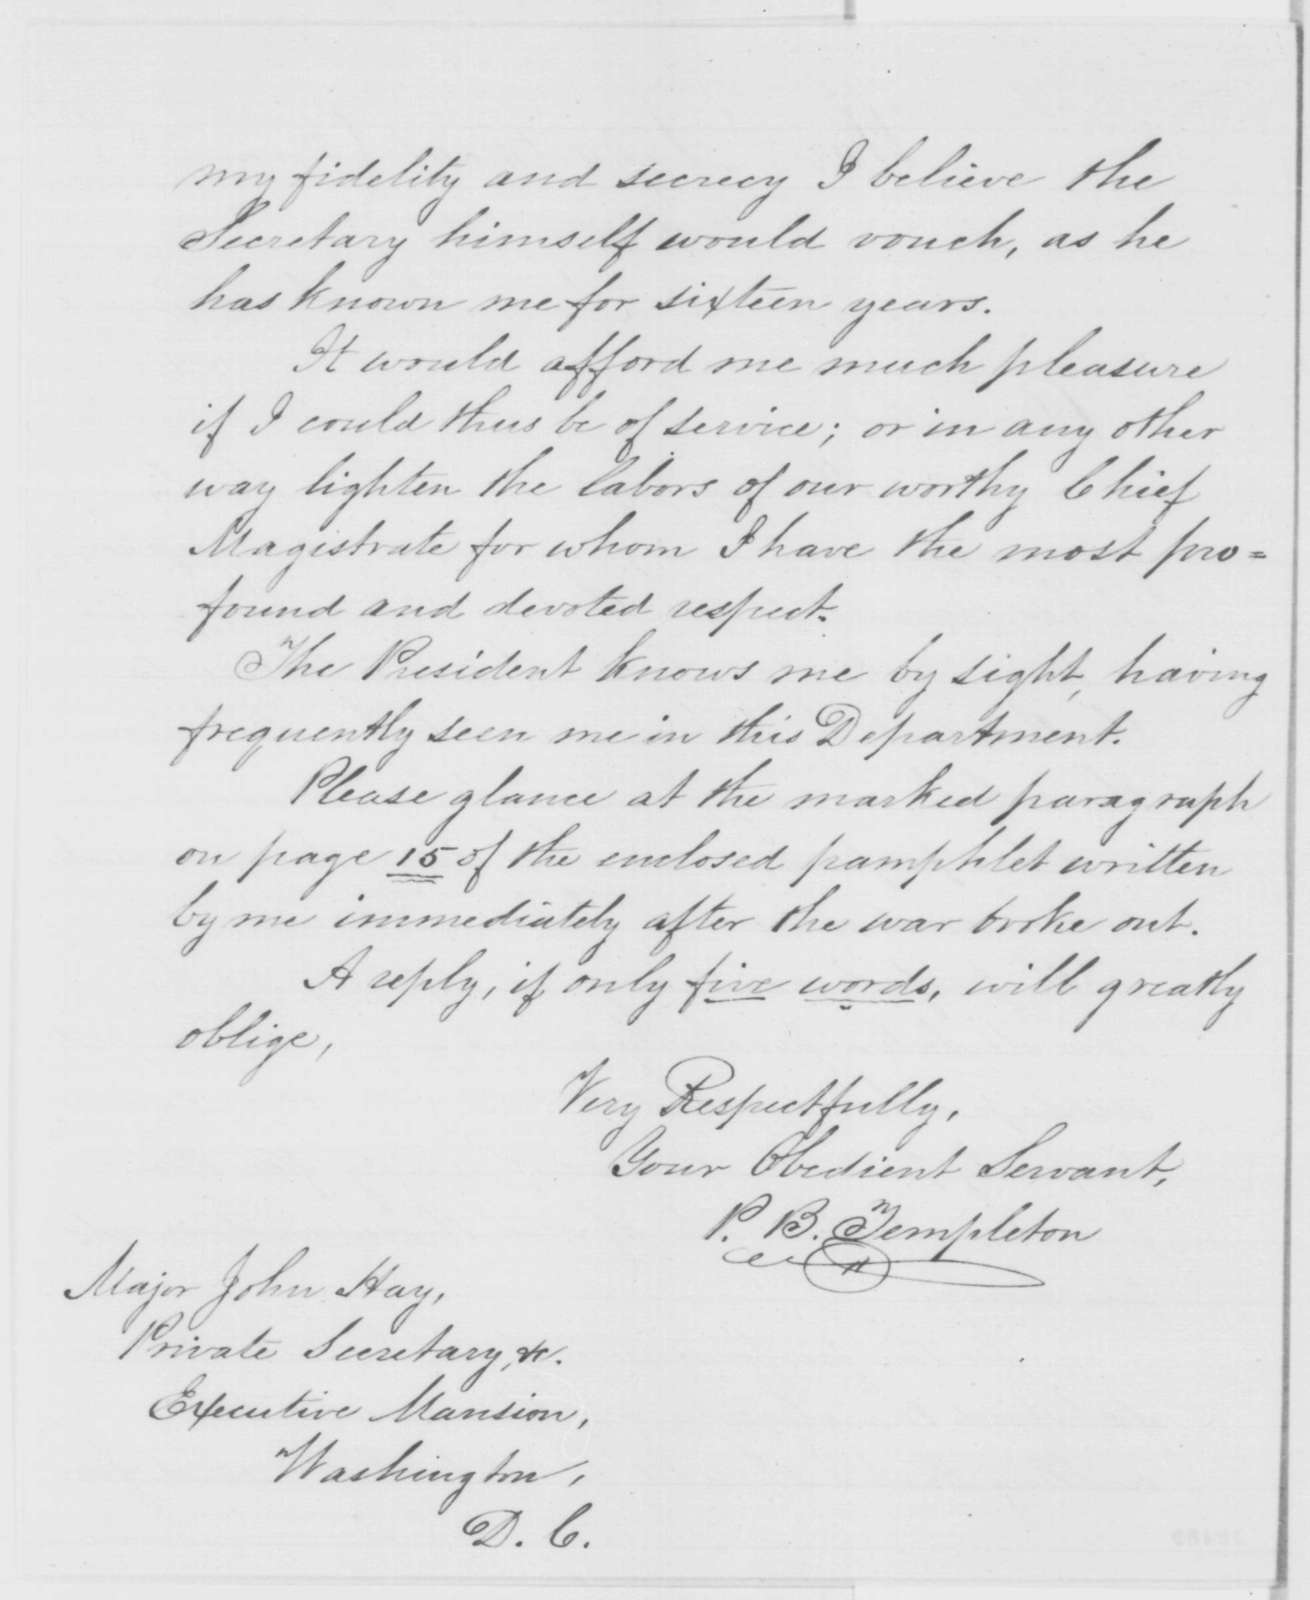 P B Templeton To John Hay Friday November 18 1864 Offers His